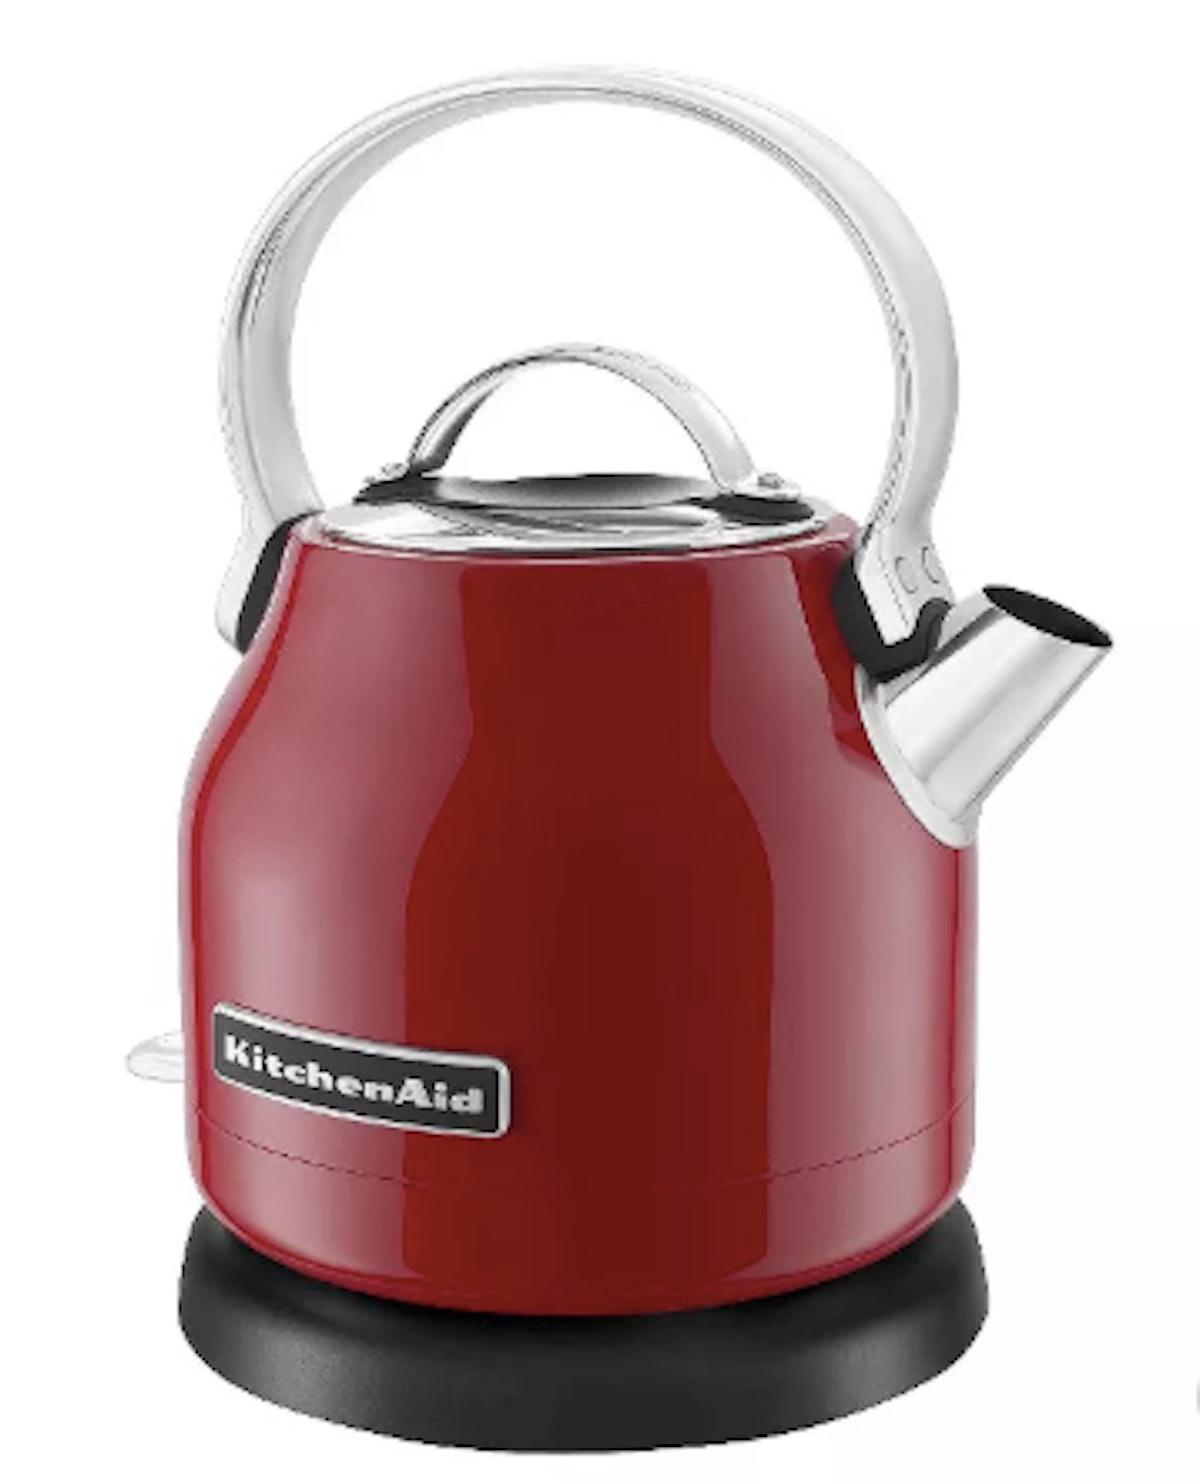 KitchenAid Small Space Electric Kettle KEK1222'